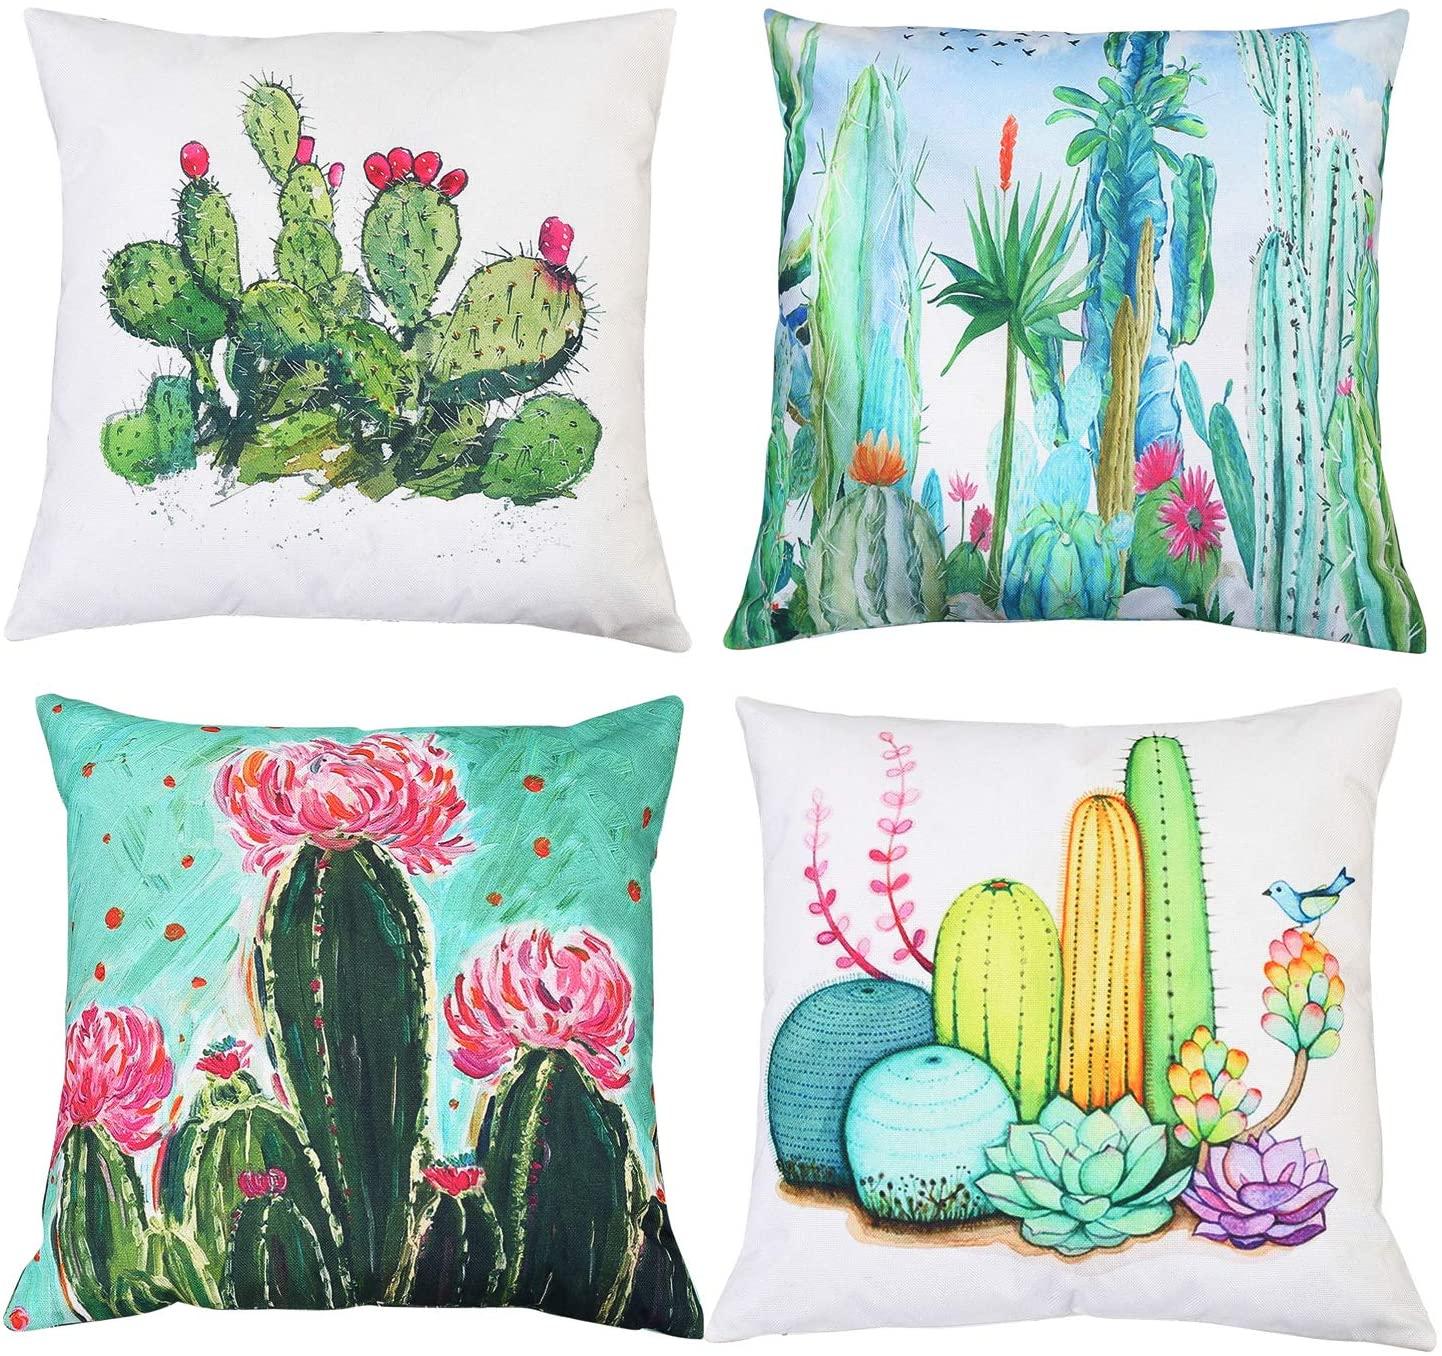 MeritChoice Succulent Pillow Cactus Pillow Cactus Throw Pillow Cactus Pillow Cover Print Double Sided Decorative Pillow Covers Set of 4 Cotton Linen 18 x 18 Inch